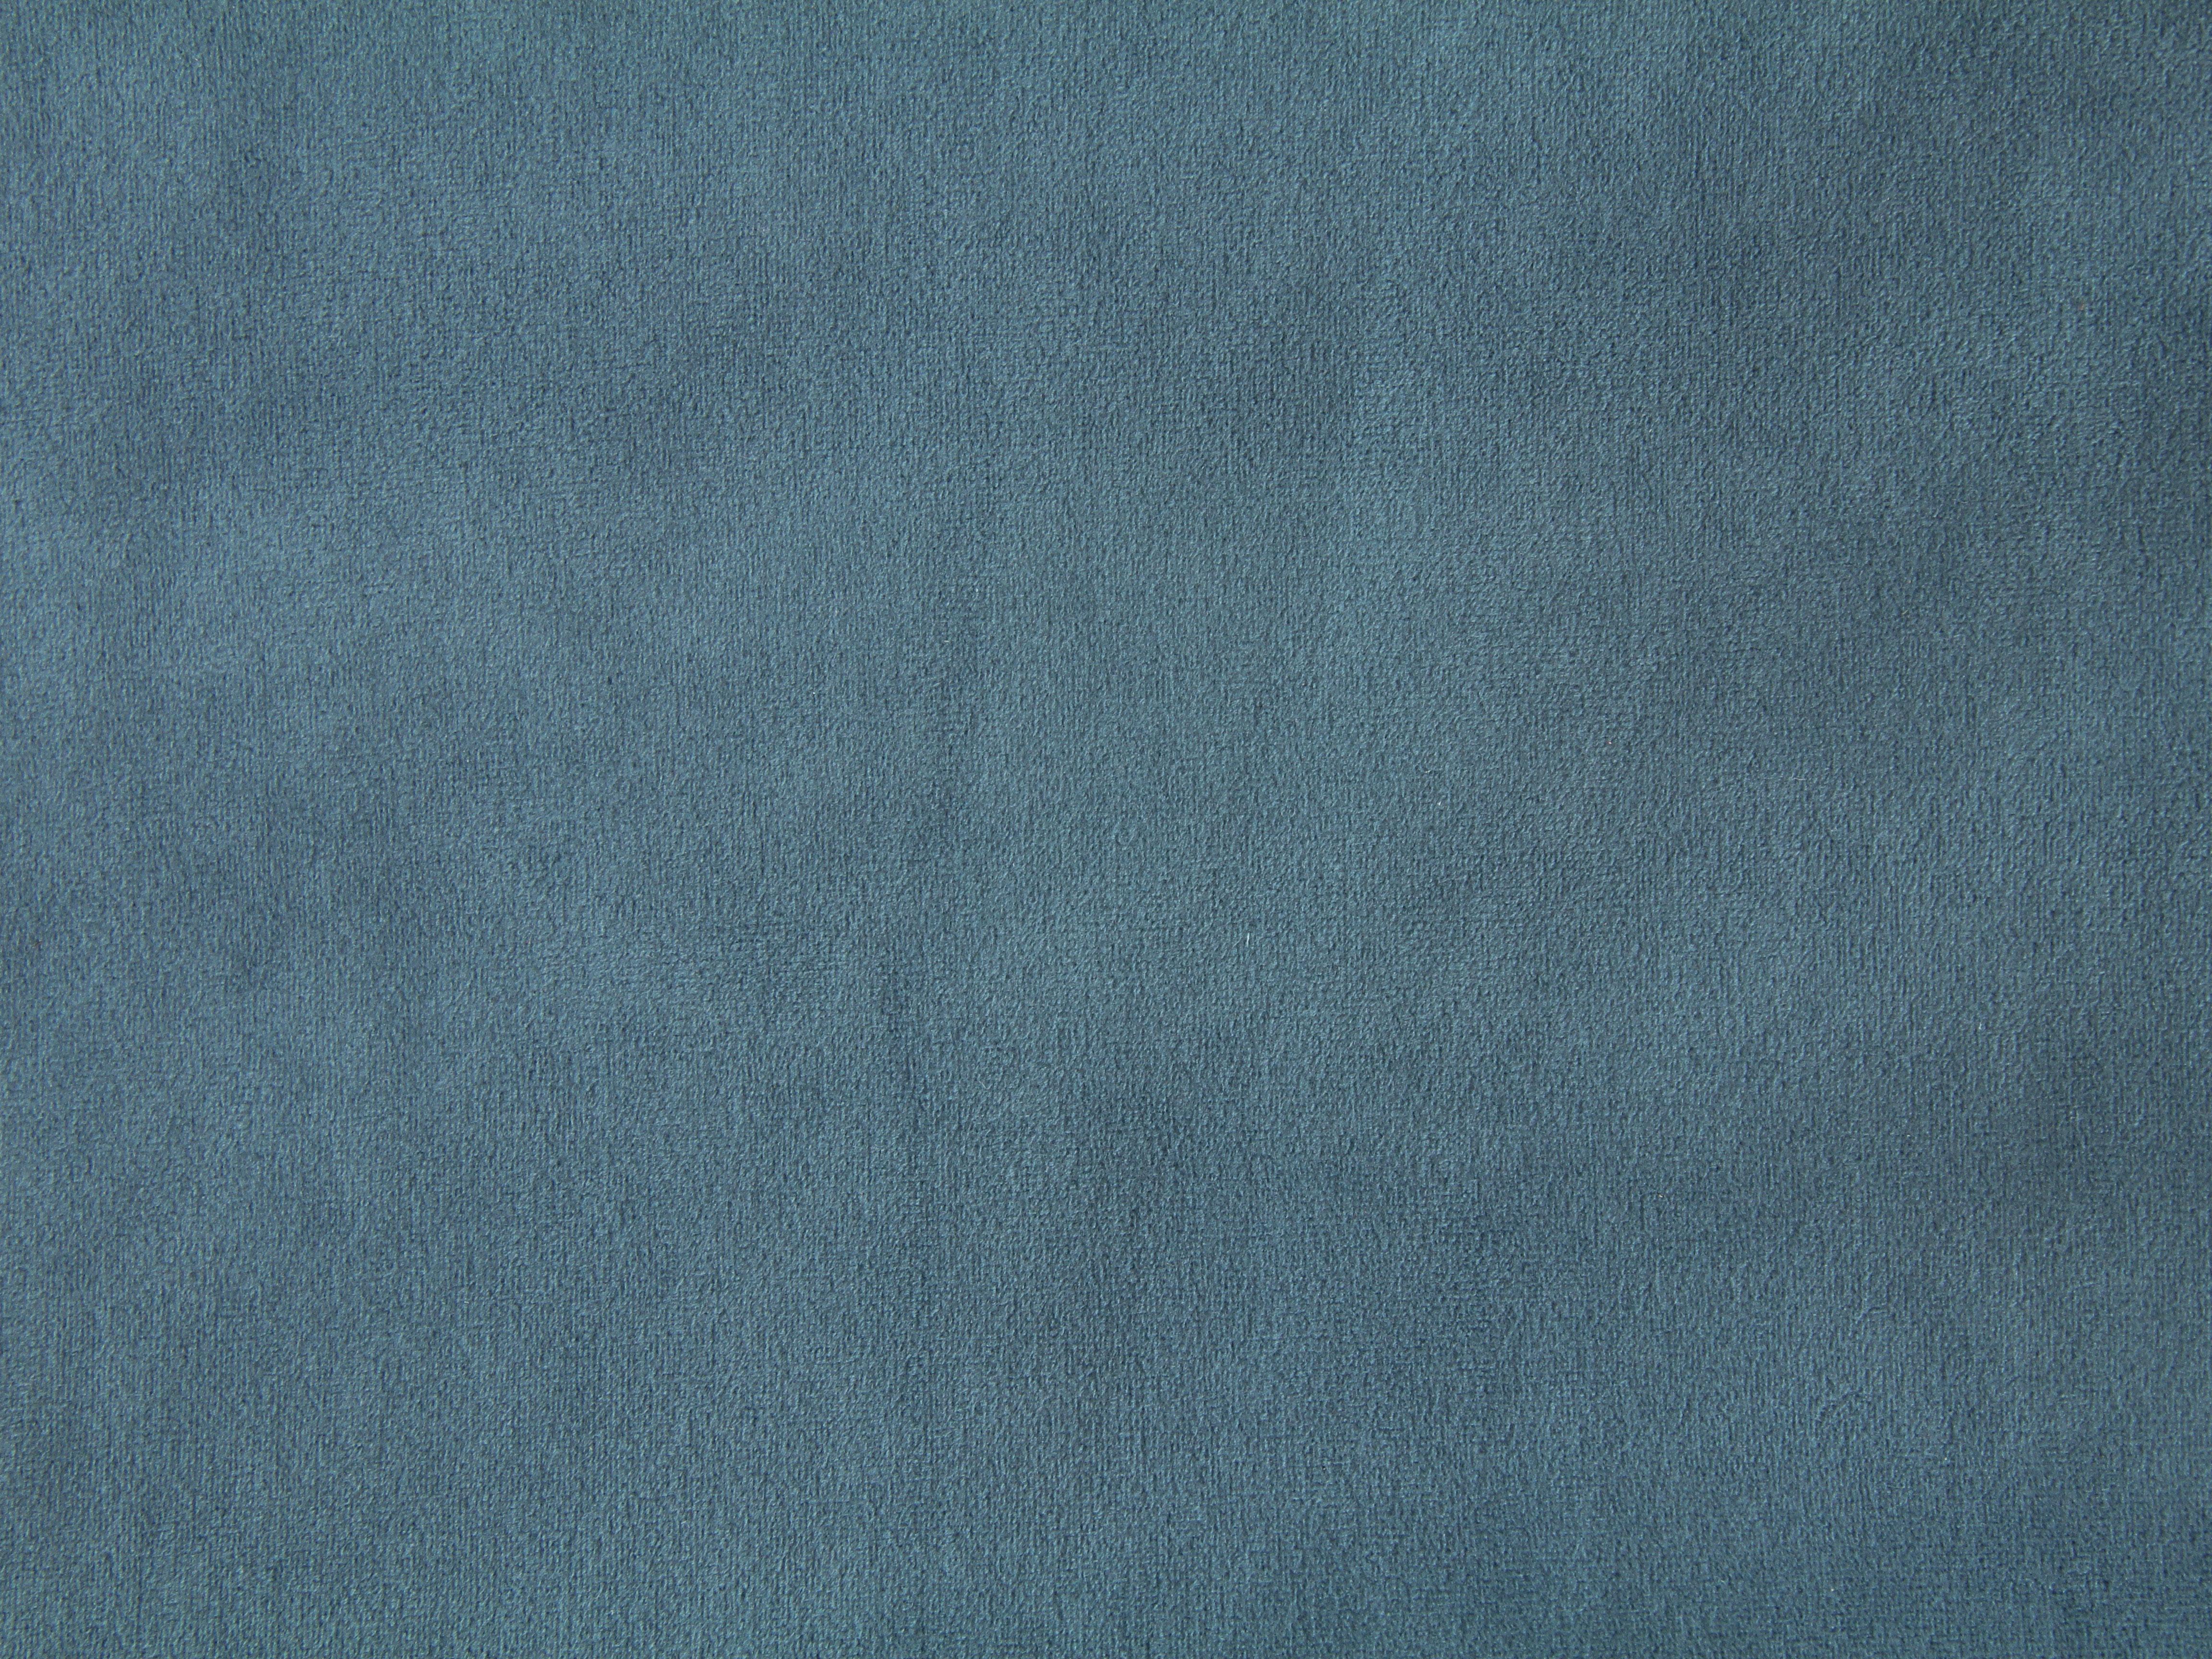 Suede Look Wallpaper Wallpapersafari HD Wallpapers Download Free Images Wallpaper [1000image.com]